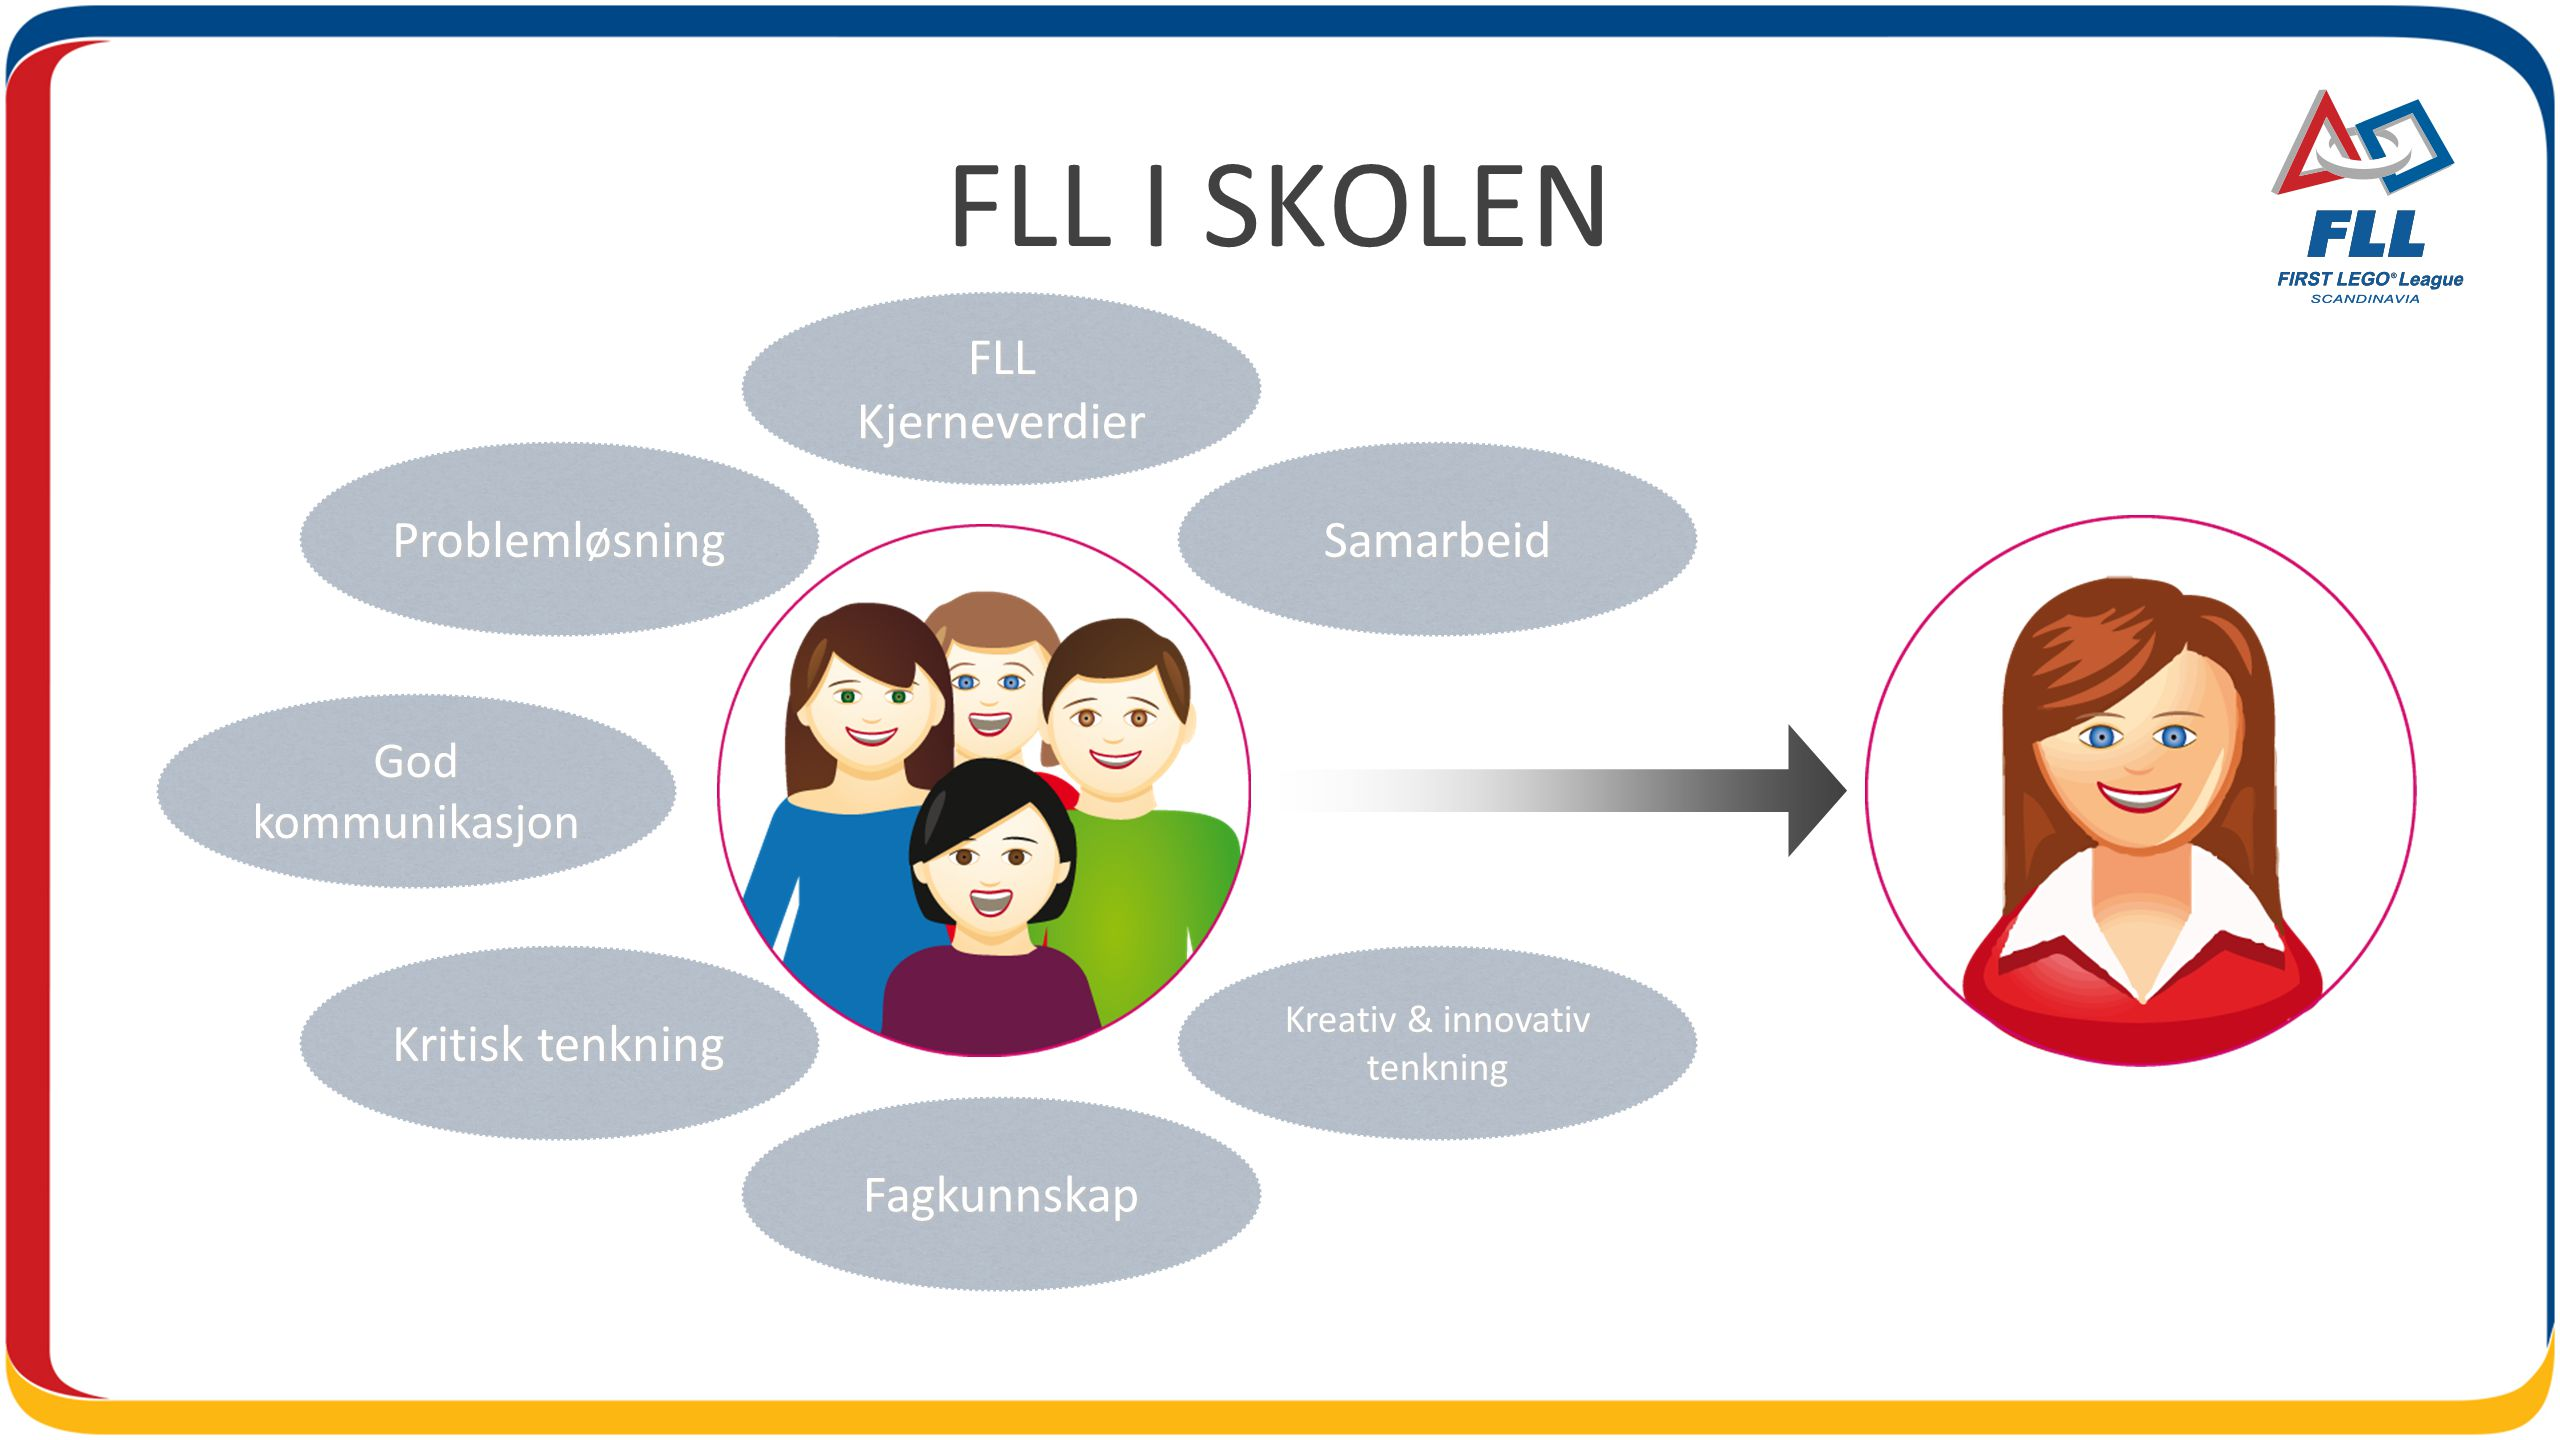 FLL I SKOLEN God kommunikasjon FLL Kjerneverdier Kreativ & innovativ tenkning Kritisk tenkning Fagkunnskap ProblemløsningSamarbeid